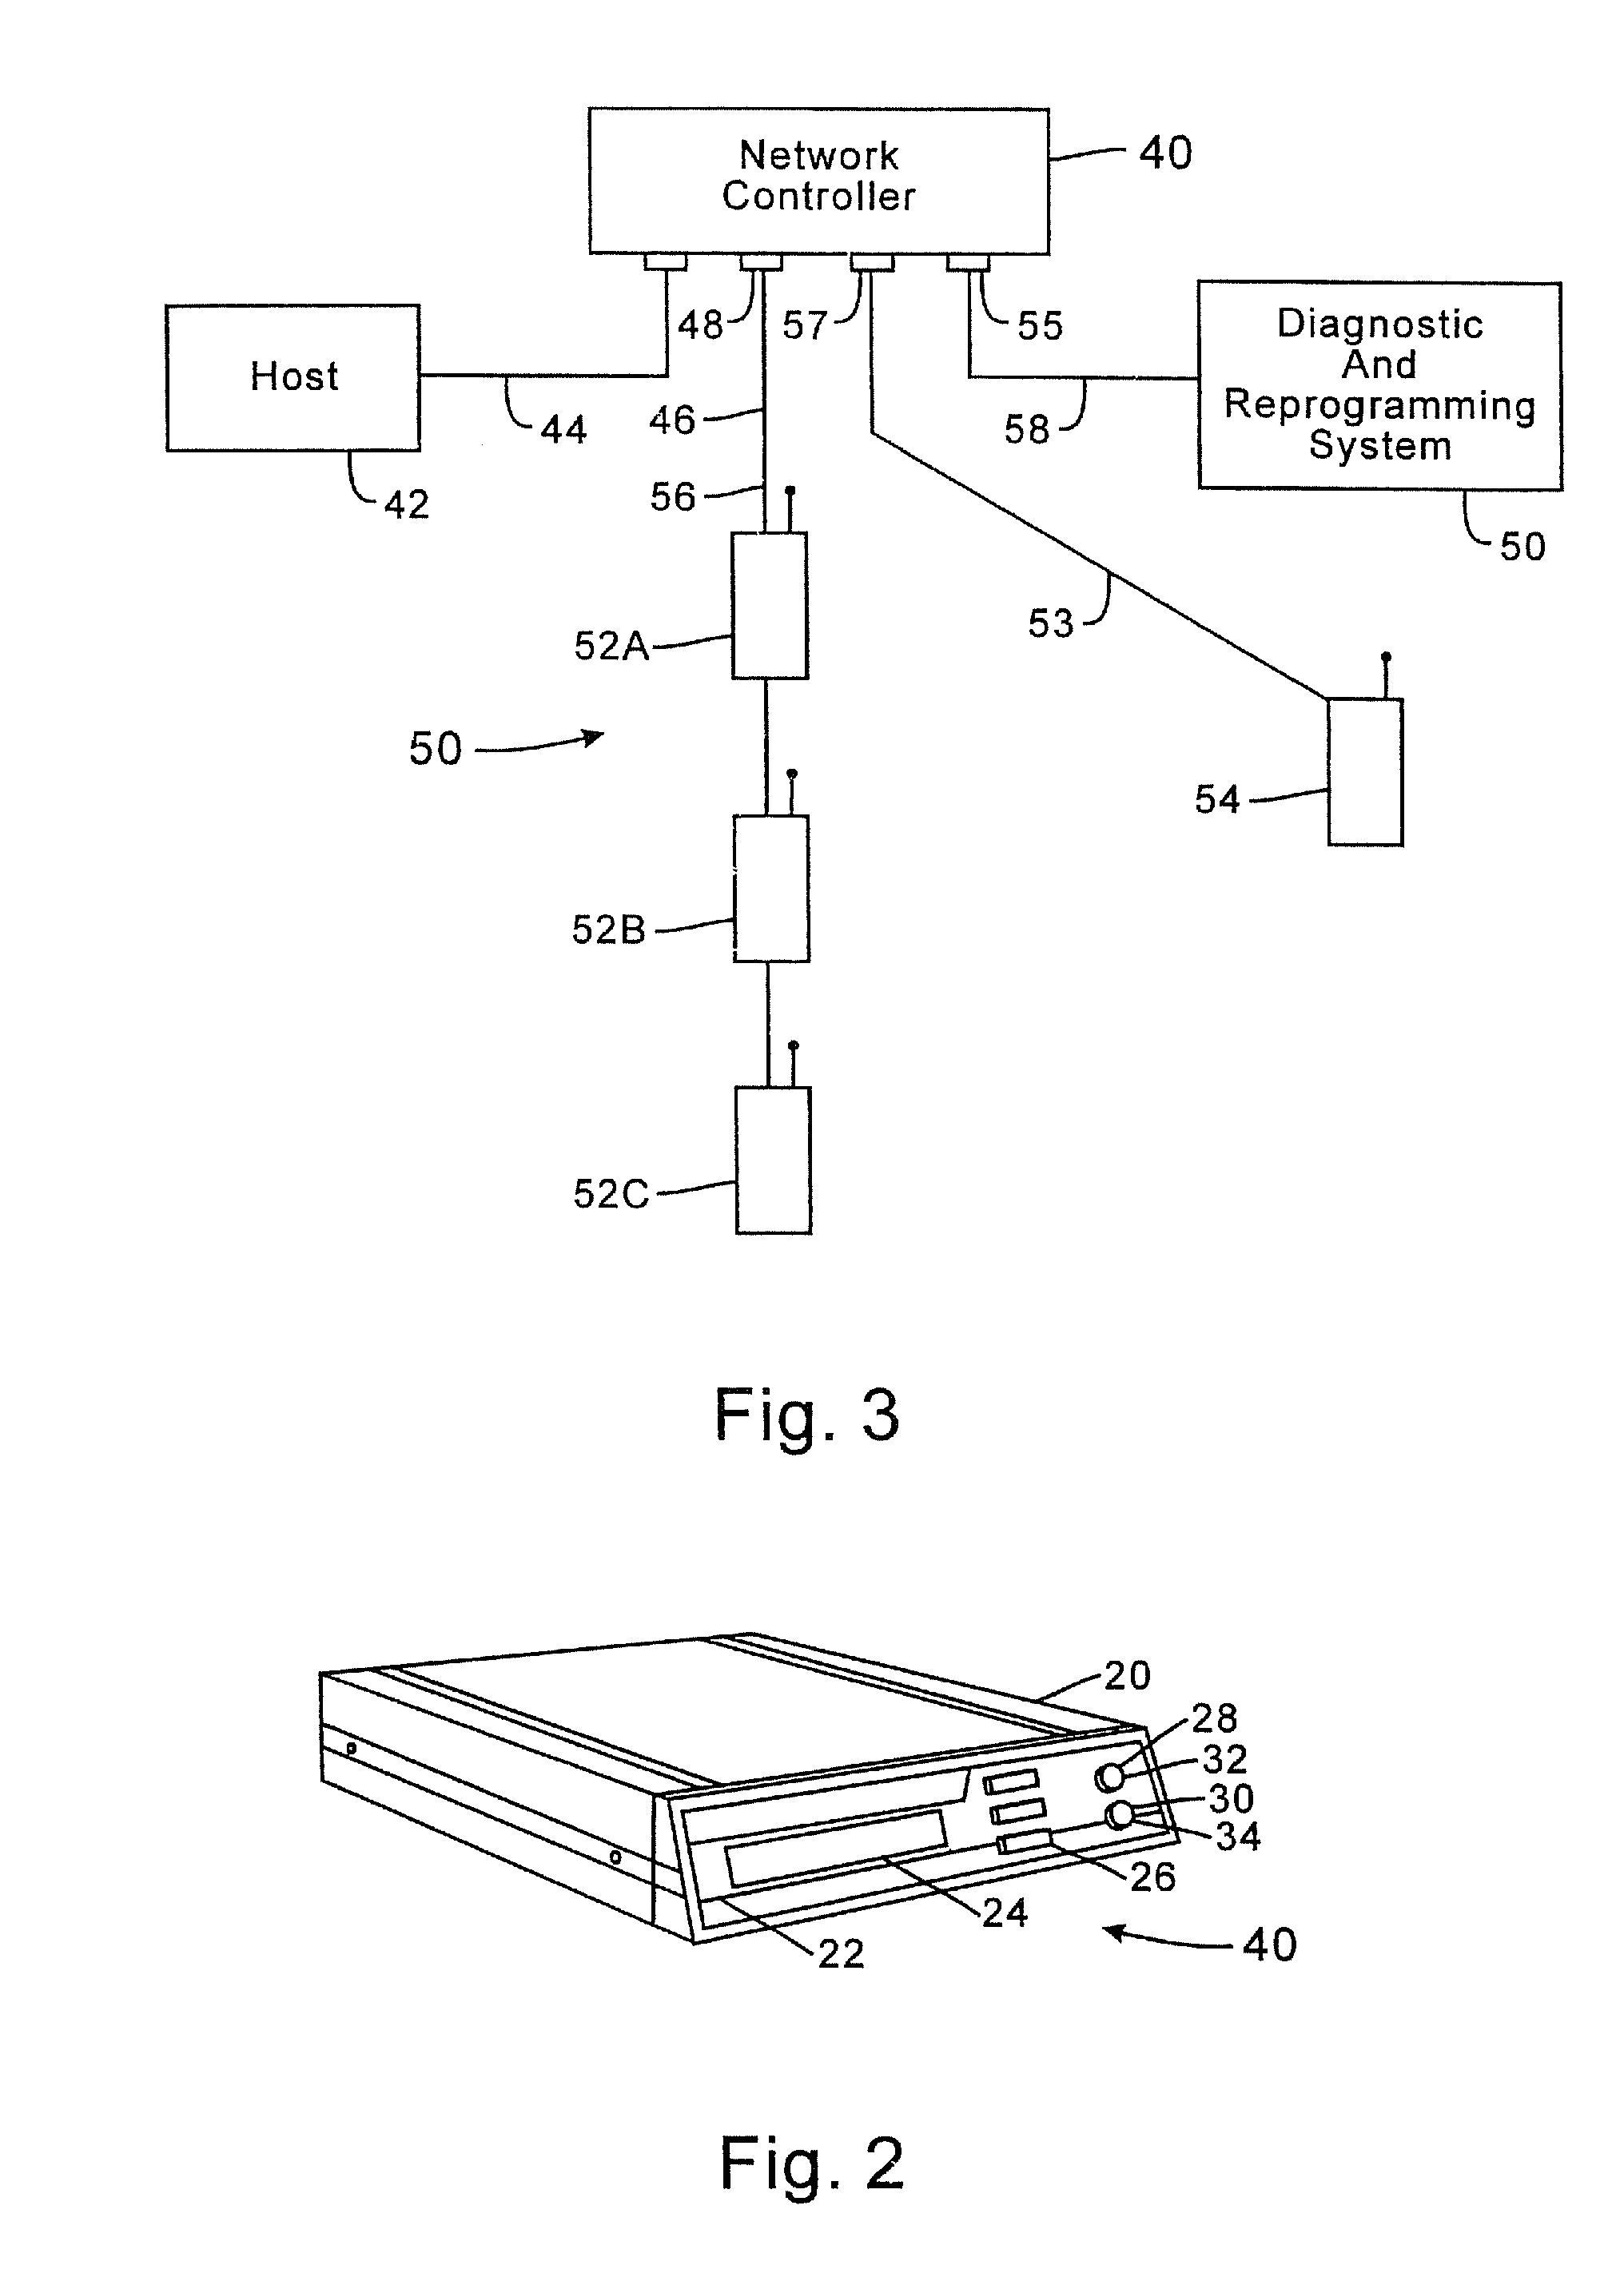 Patent US 7,873,343 B2